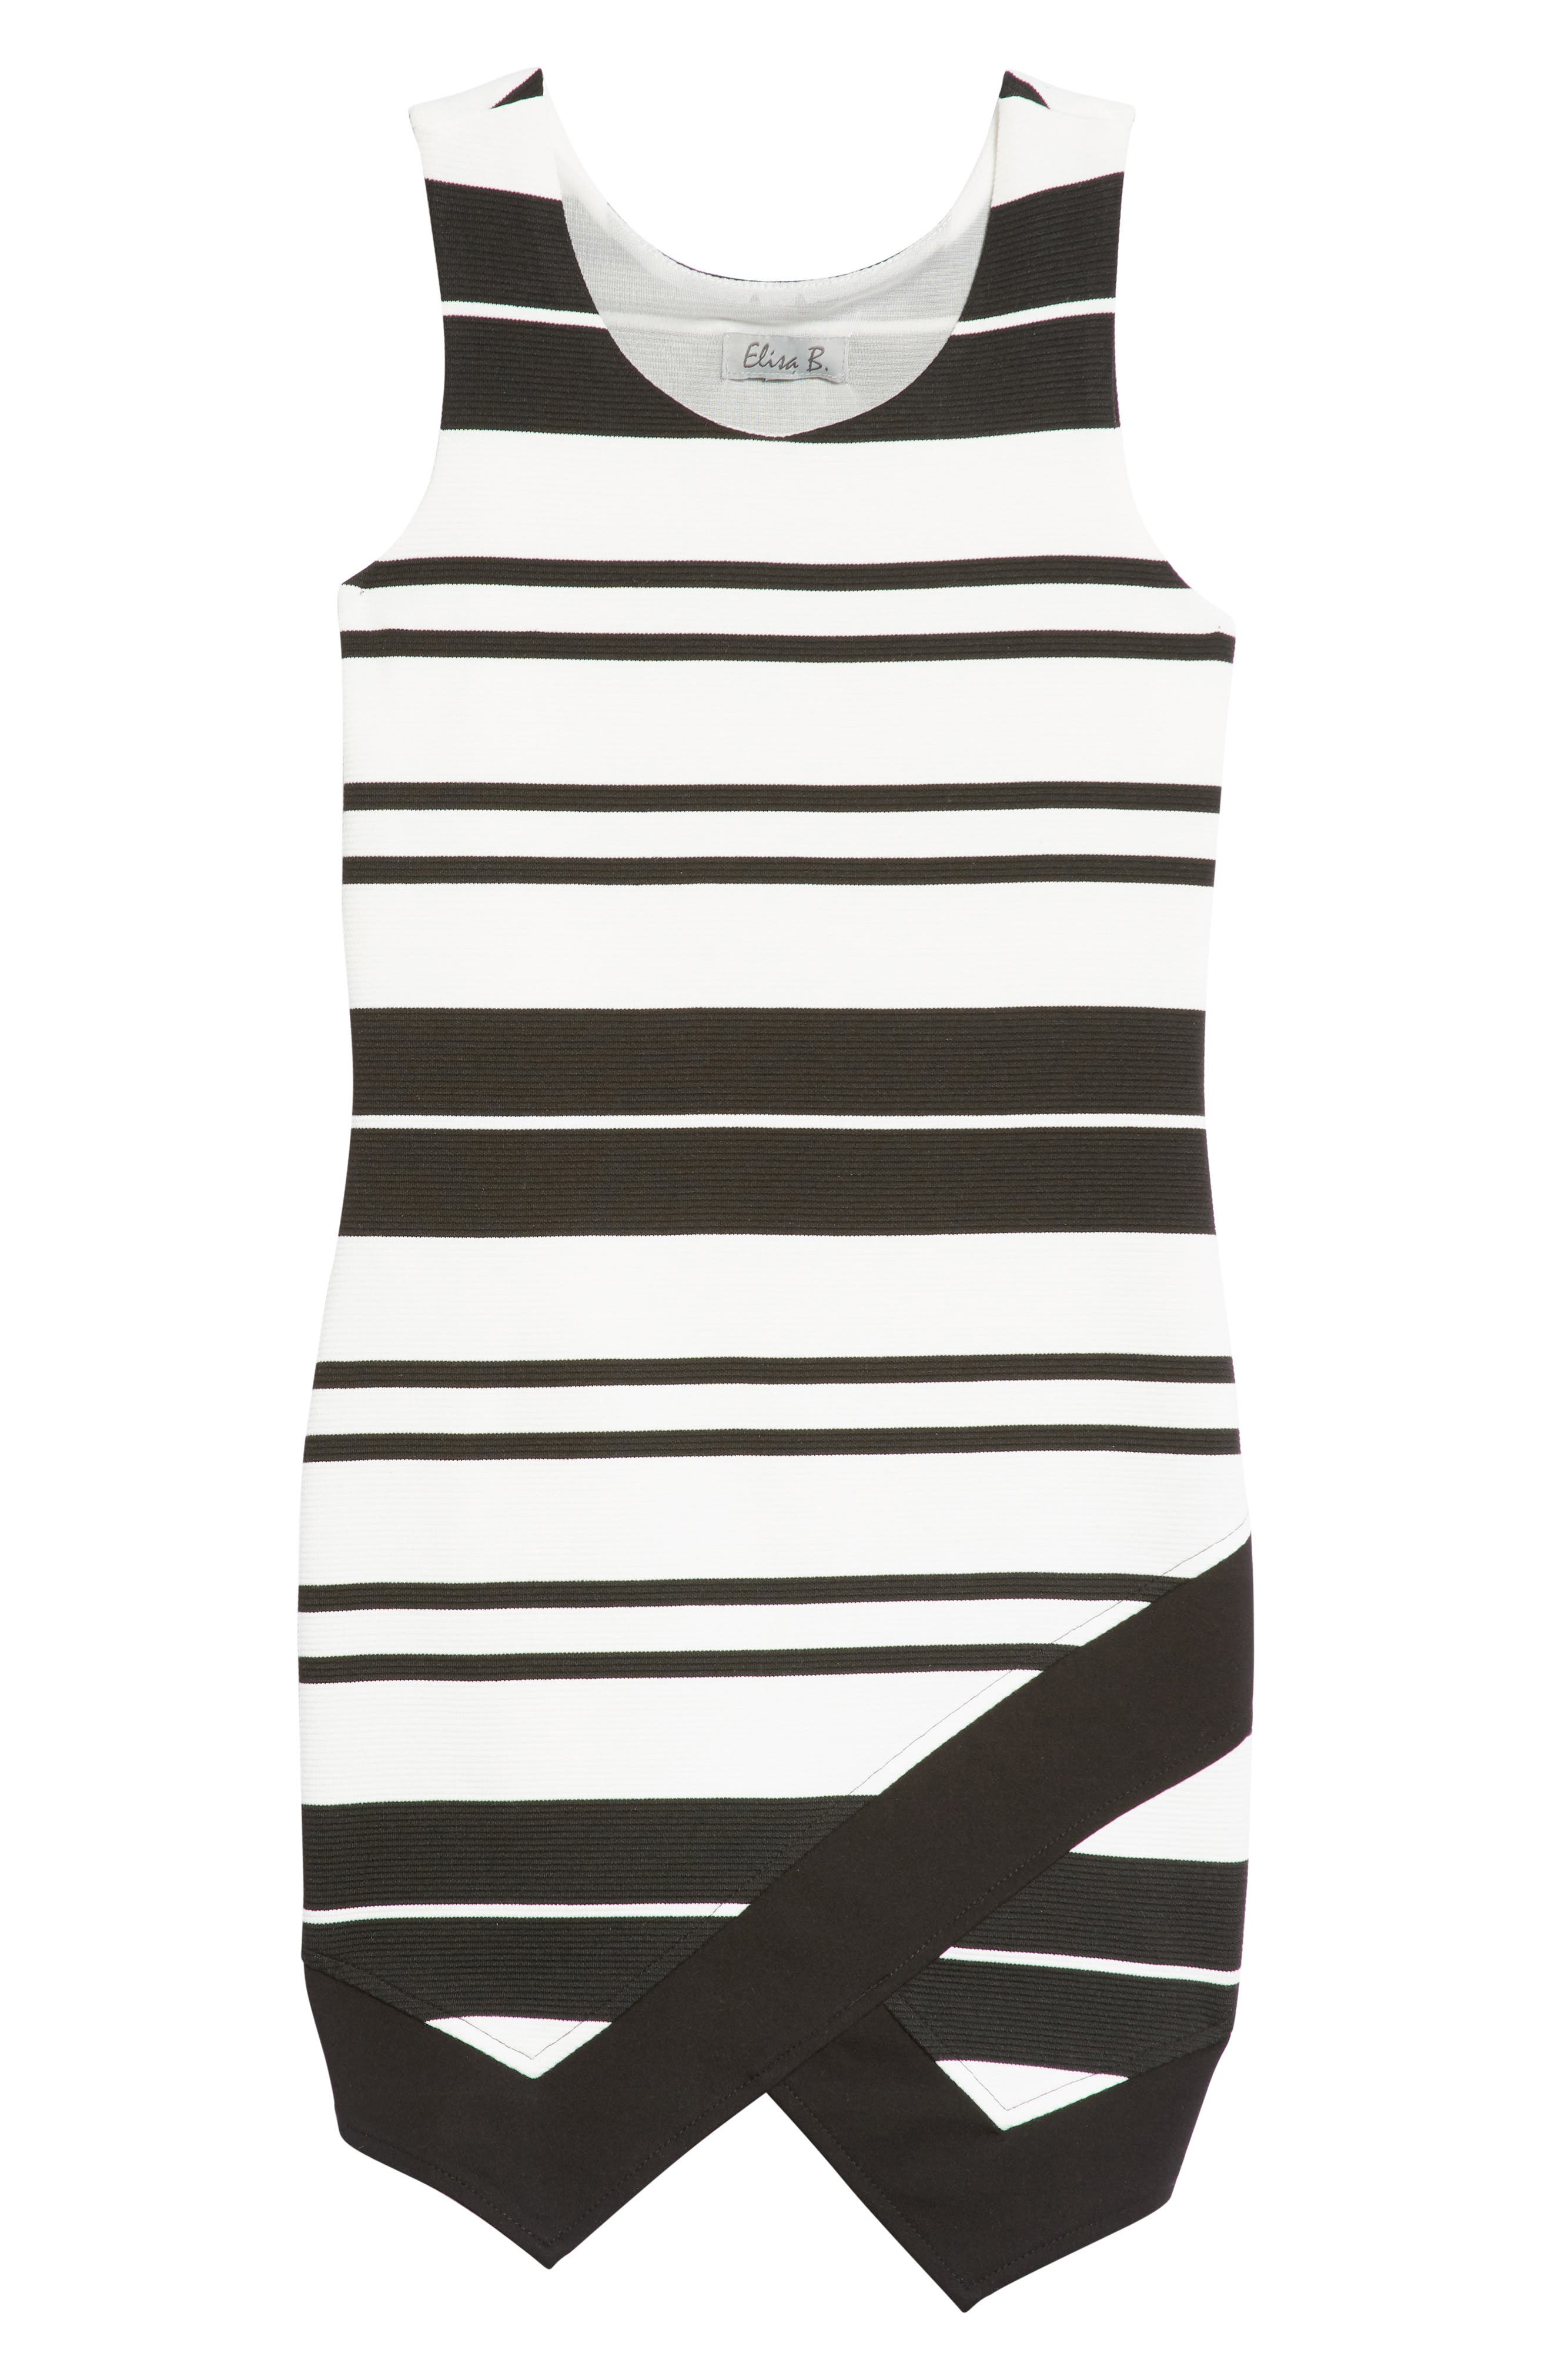 Main Image - Elisa B Novelty Texture Knit Dress (Big Girls)